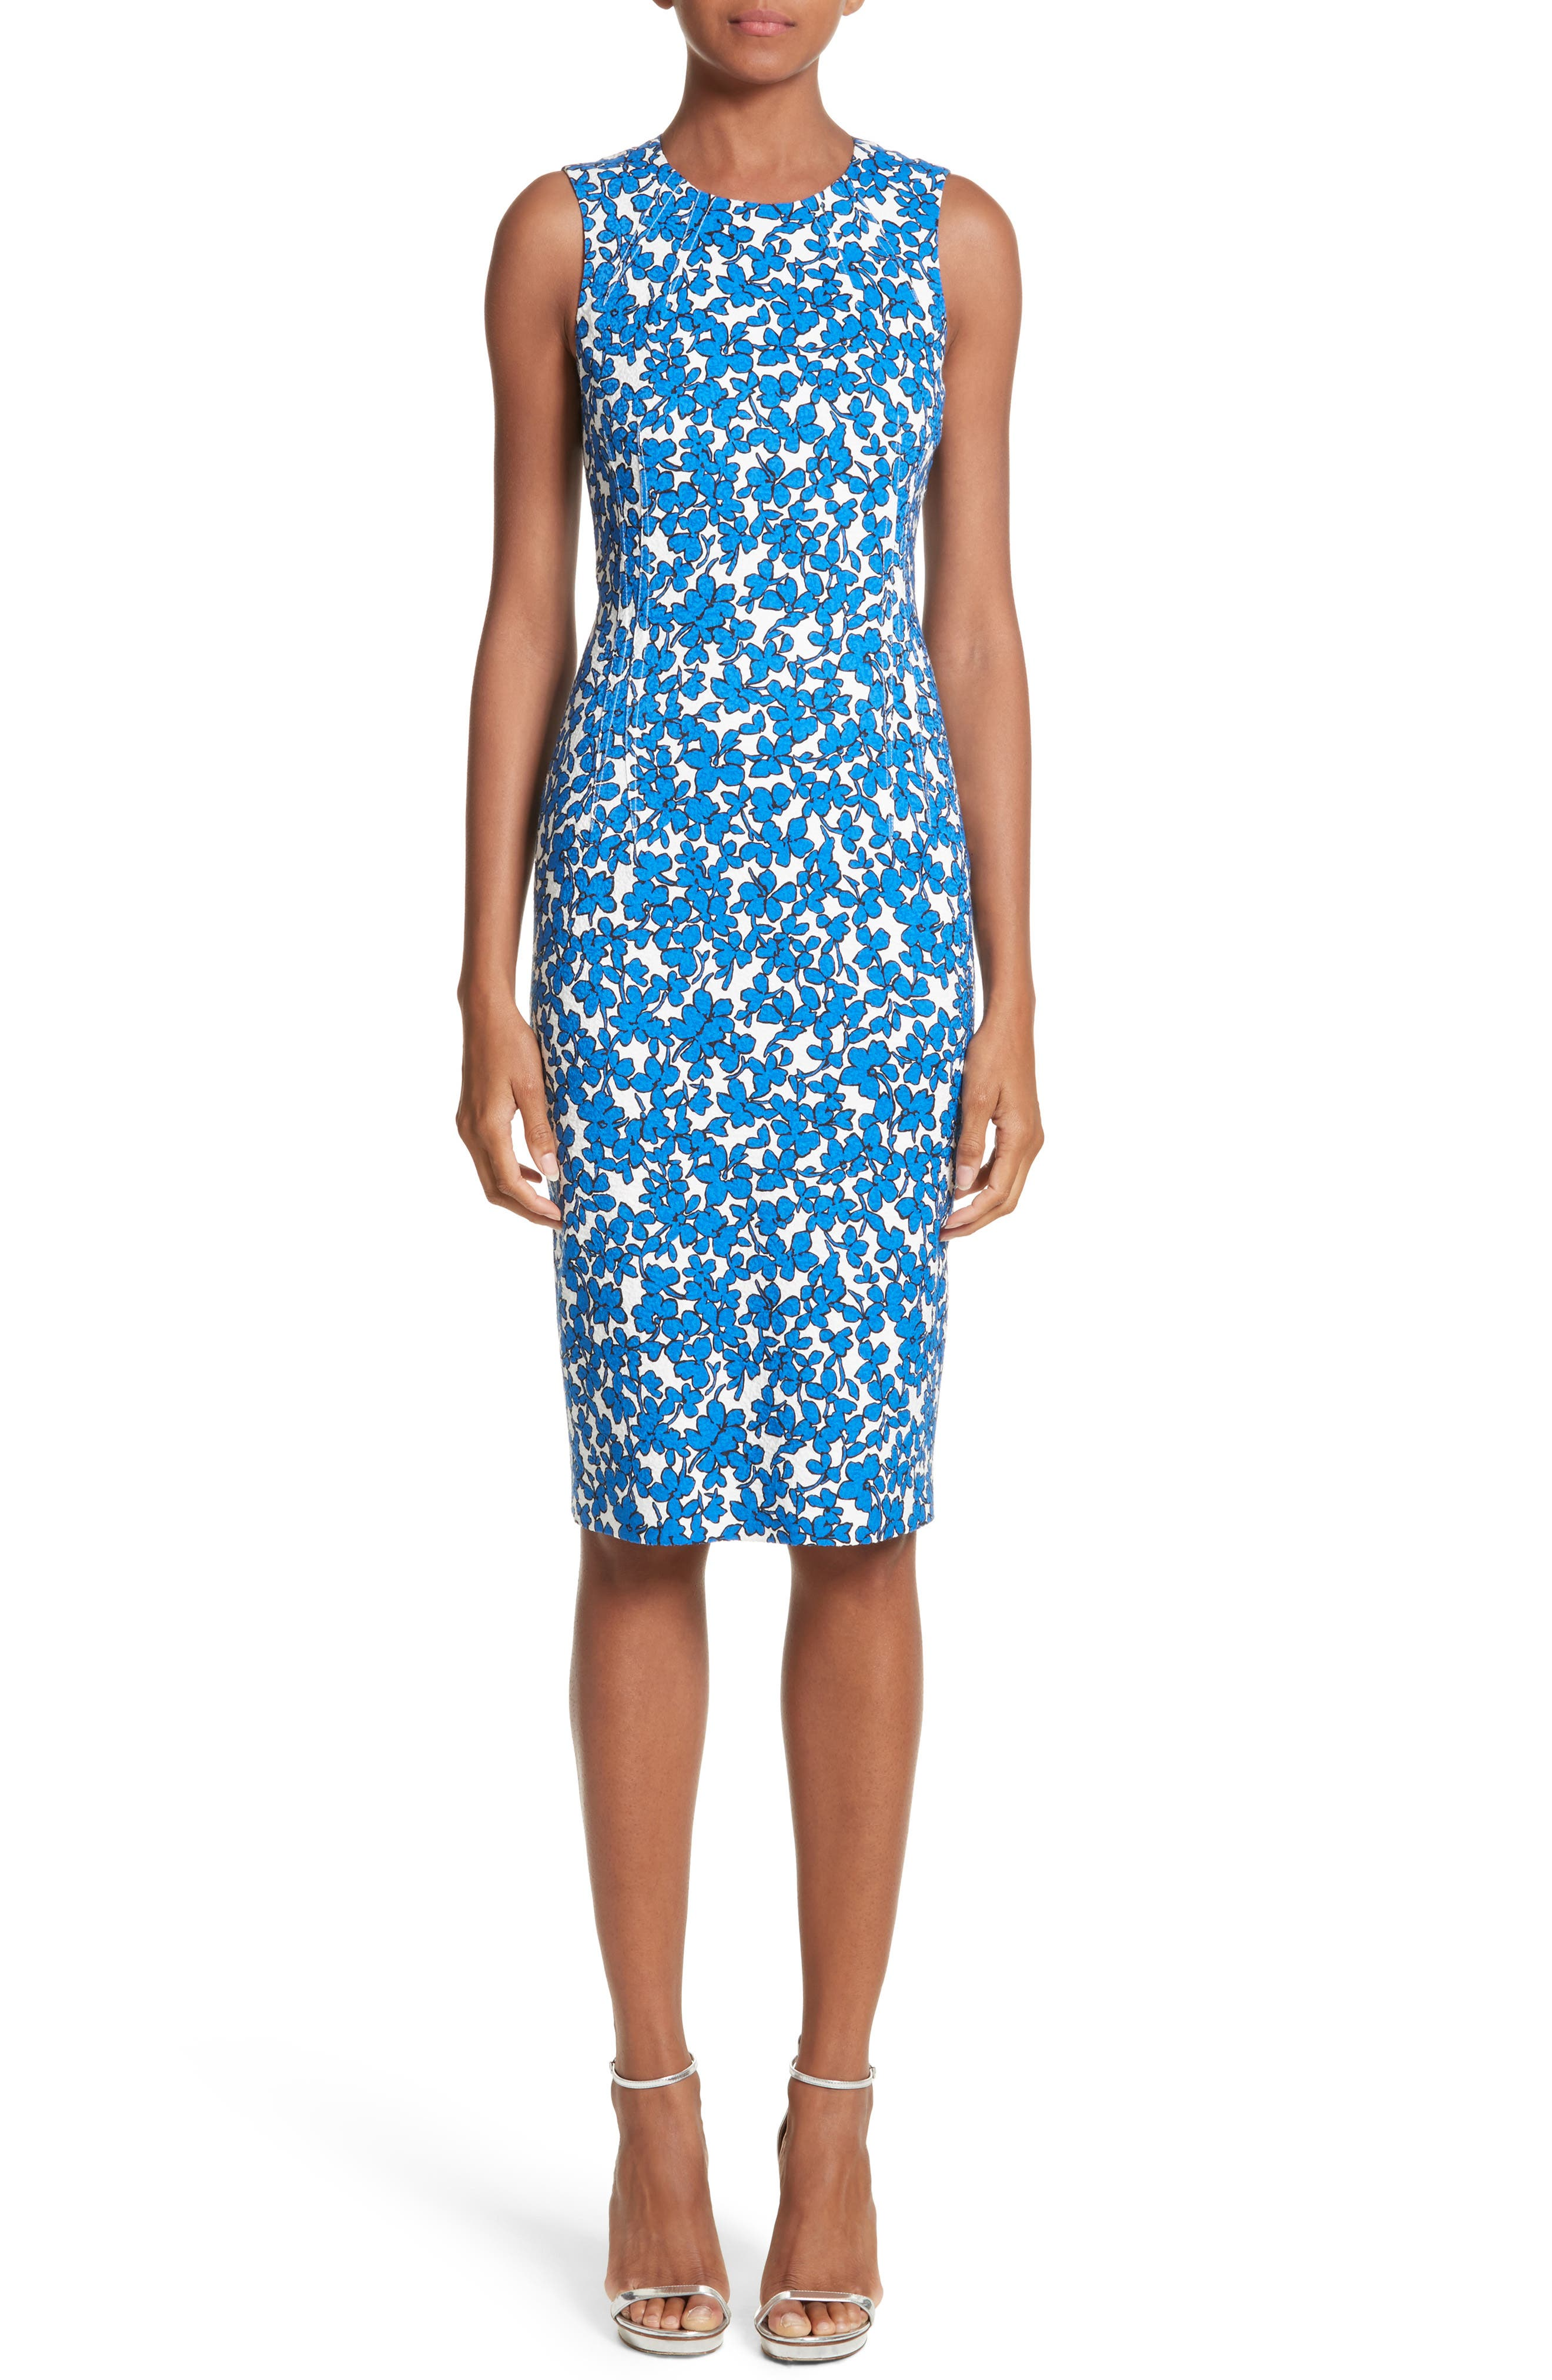 Michael Kors Floral Print Sheath Dress